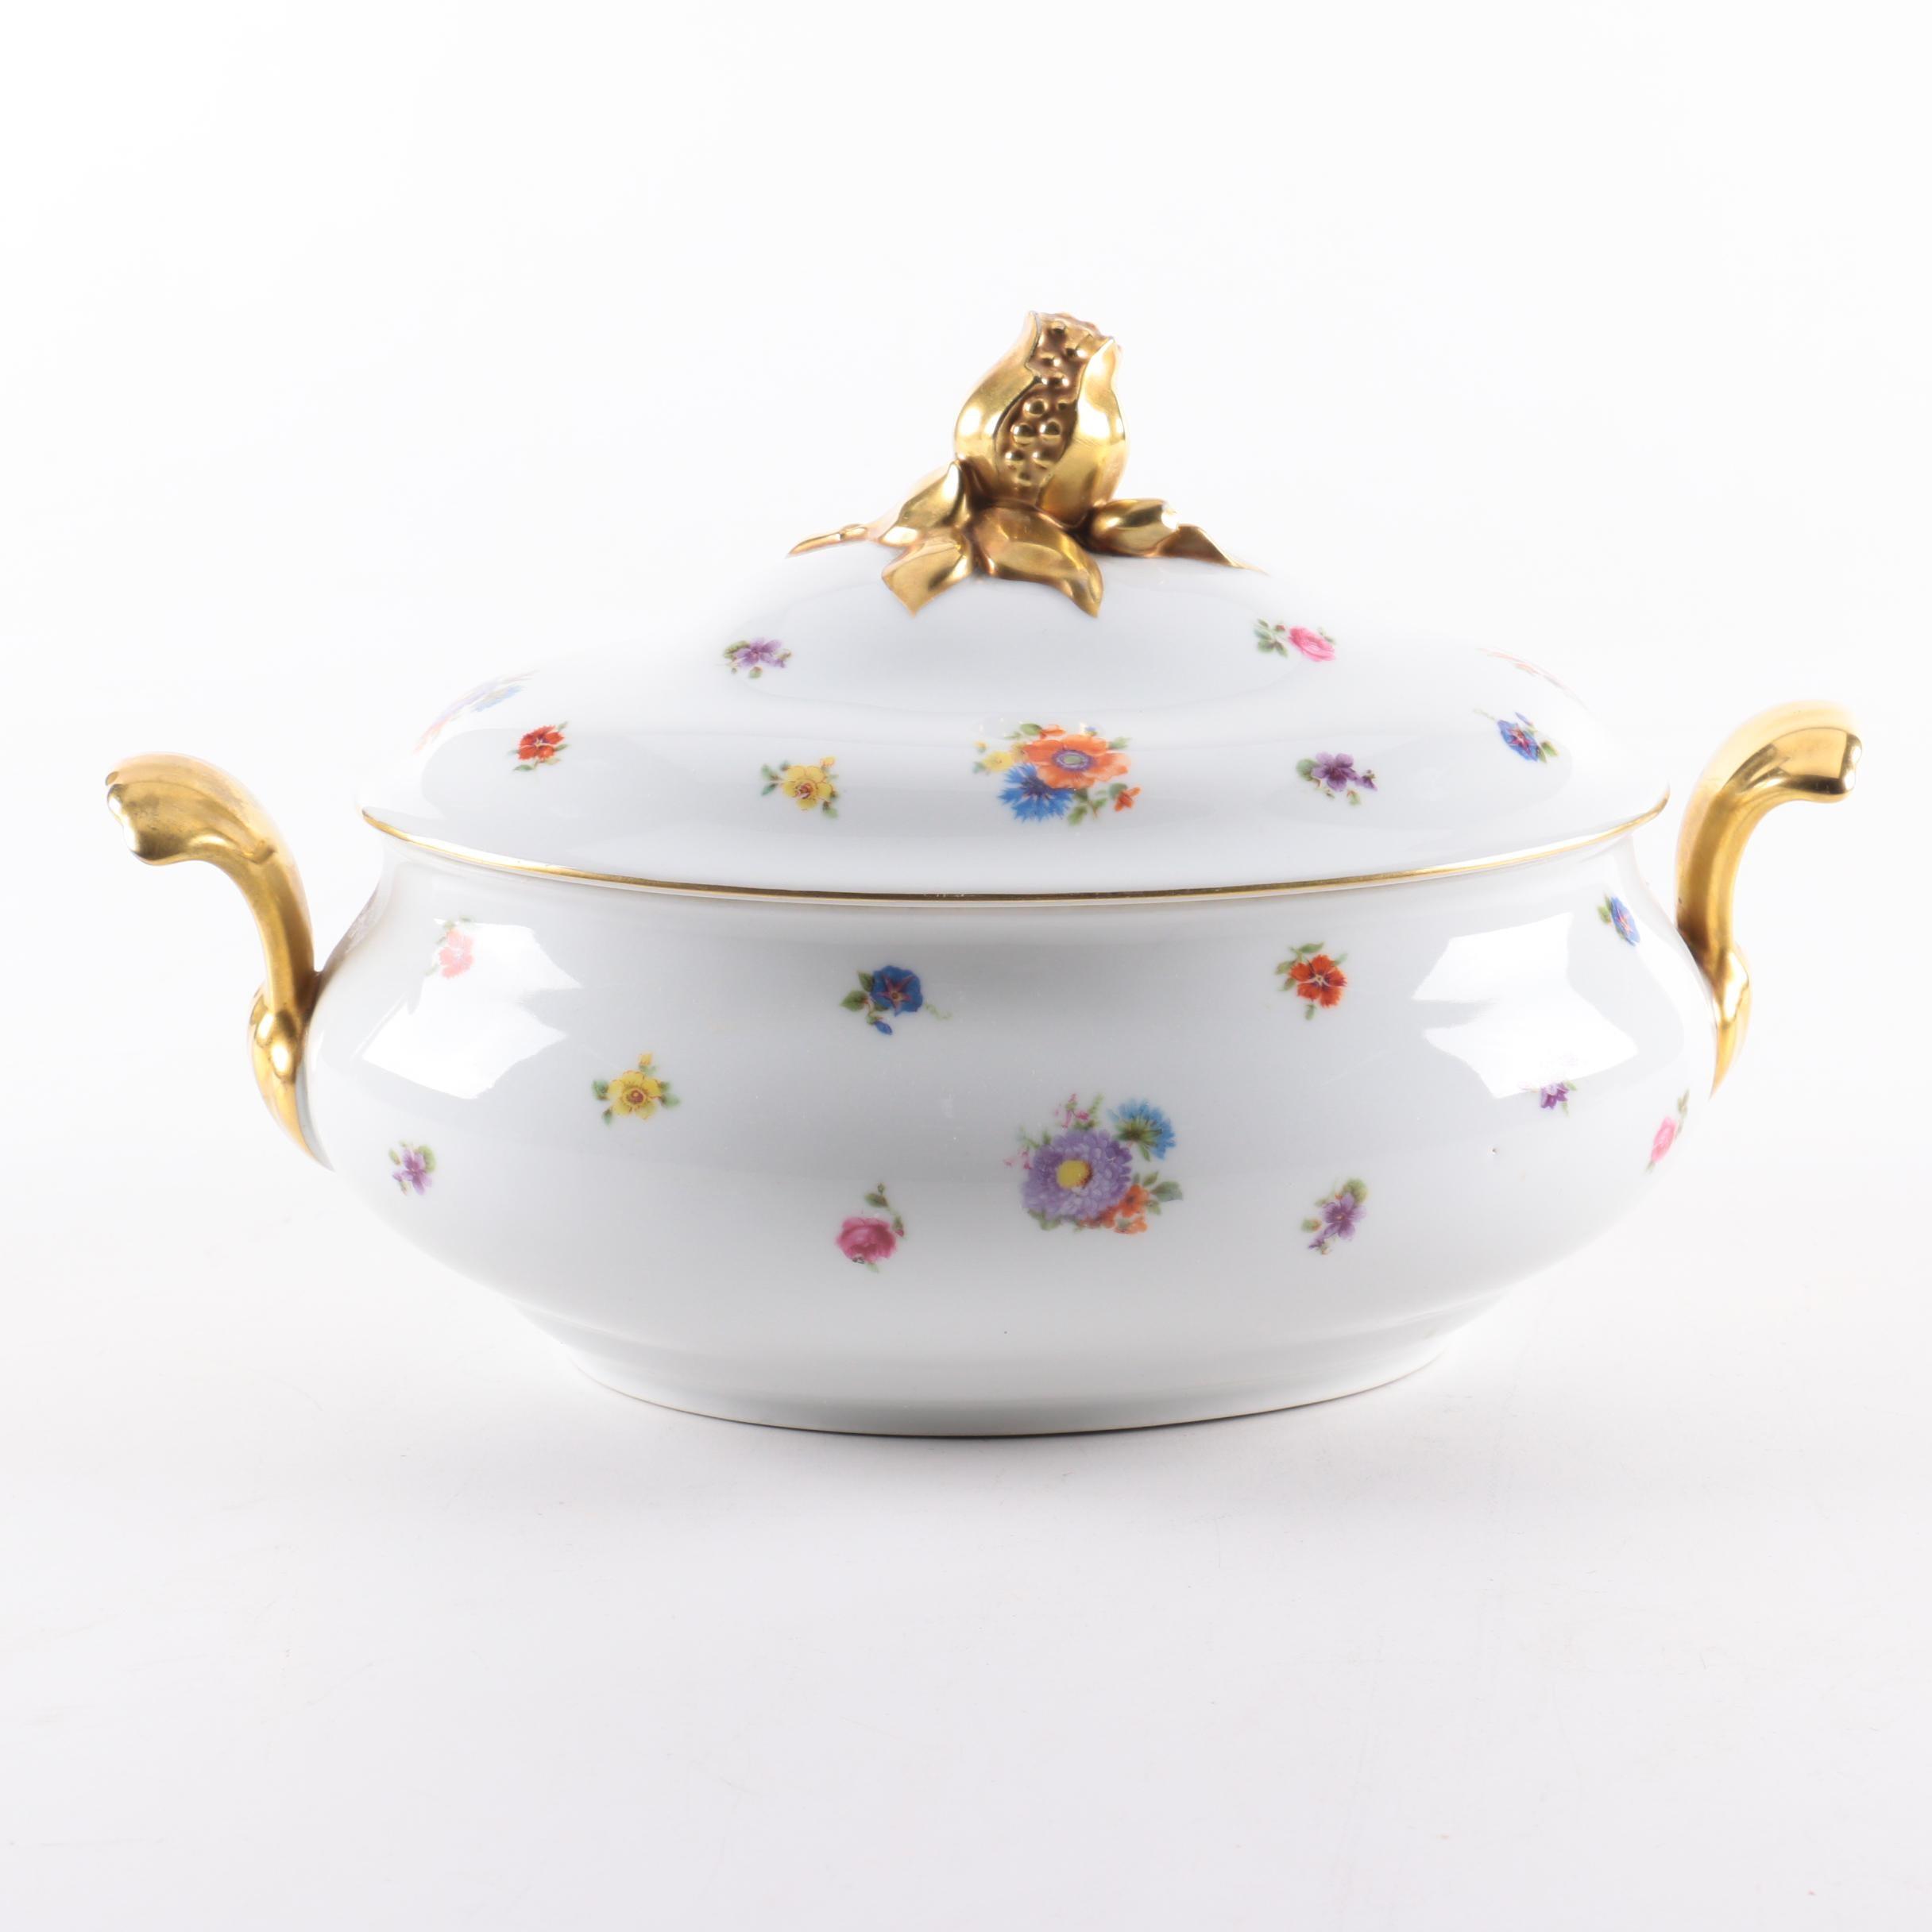 1924-46 Seltmann Porcelain Covered Vegetable Bowl